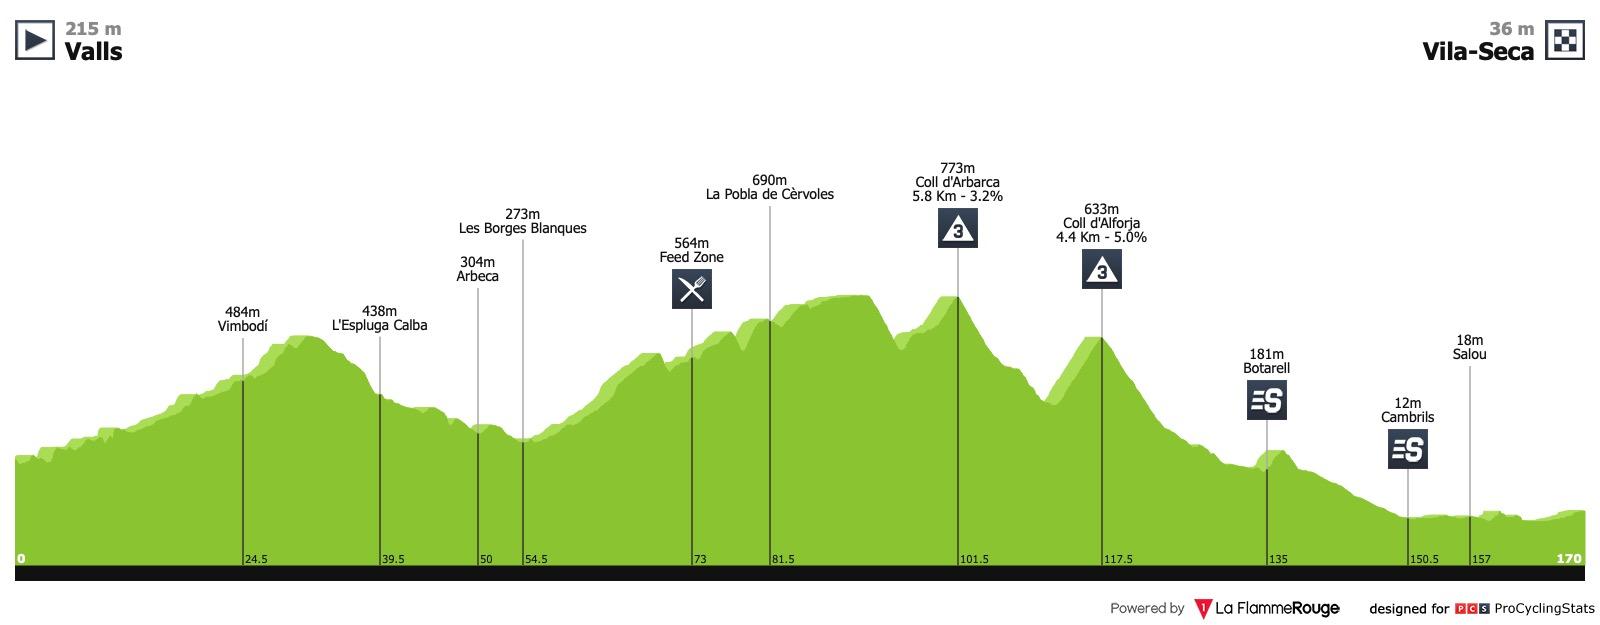 Volta Ciclista a Catalunya - Page 4 Volta-a-catalunya-2019-stage-6-profile-n2-8fa62c2998